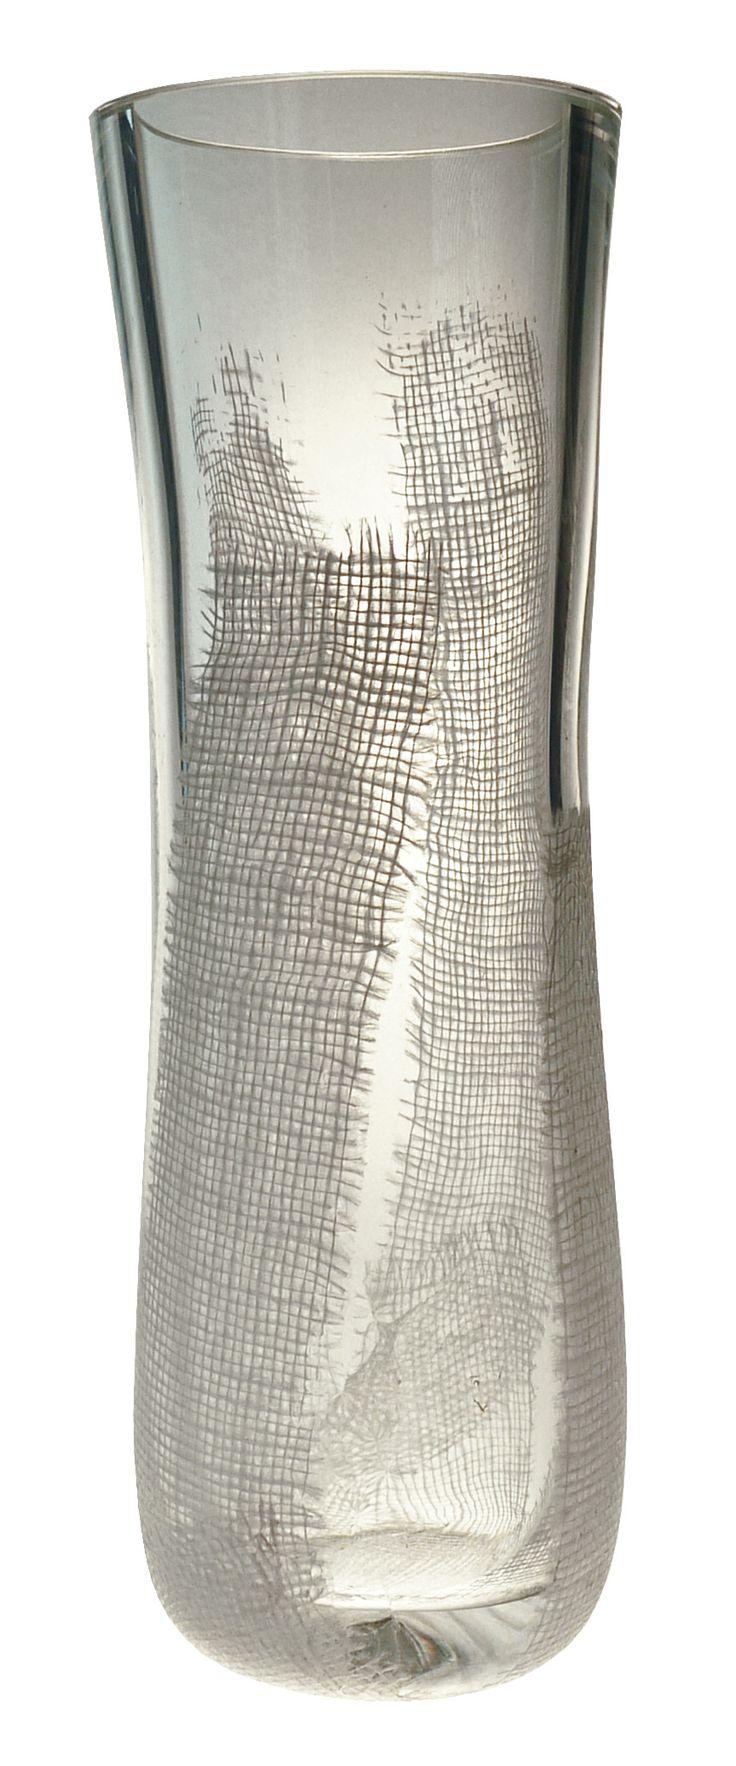 vase verre inclusion tissu chez maniglier